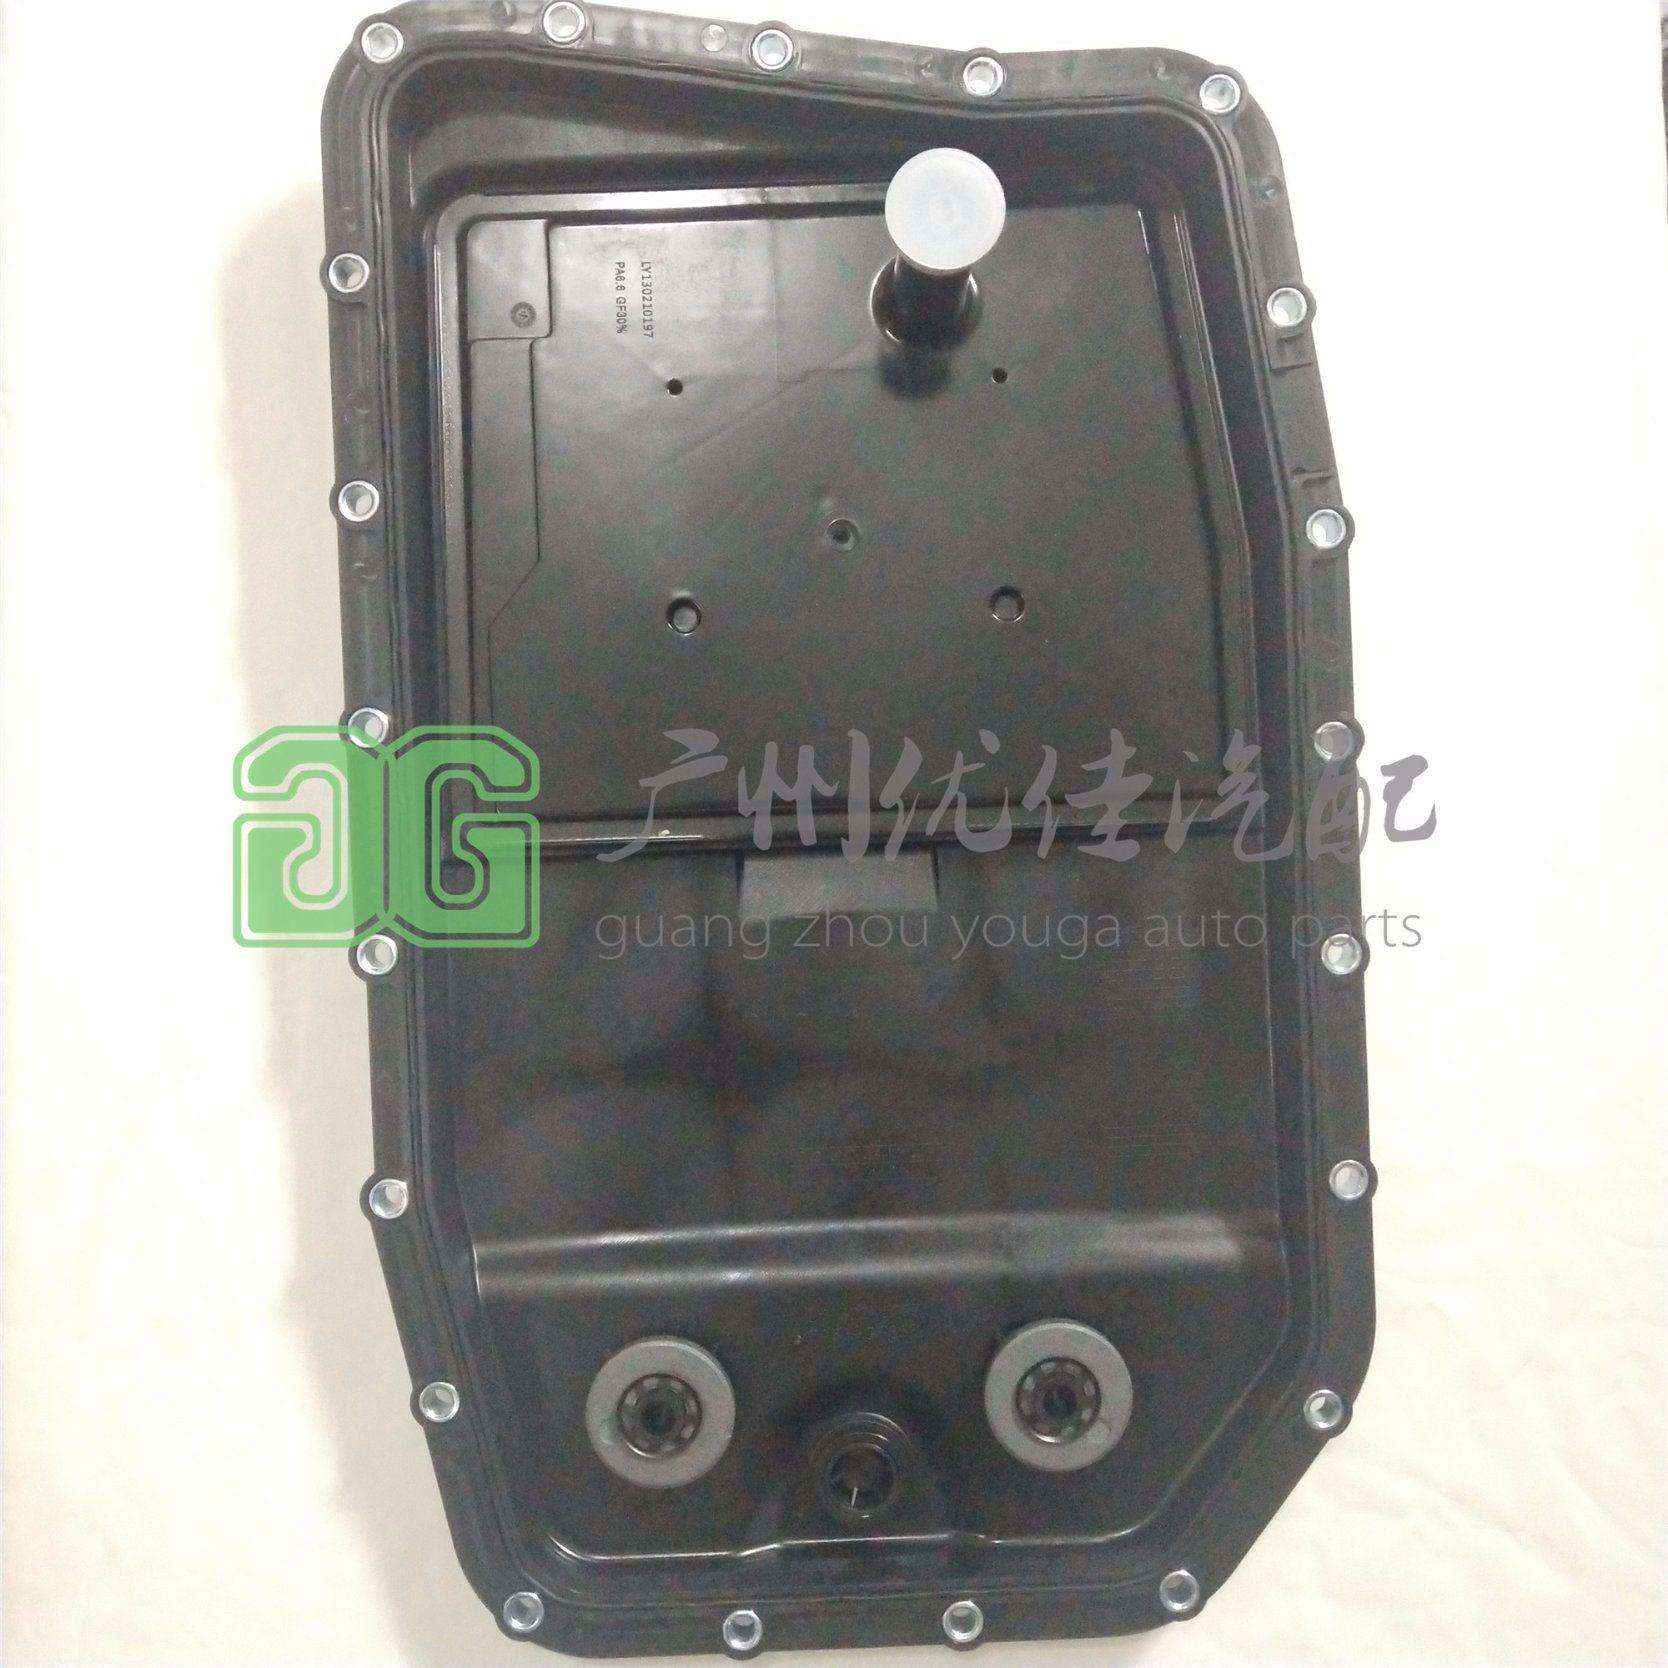 [Hot Item] Automobile Parts 24117571227 Transmission Oil Pan Sump for BMW  E65 E66 E60 E90 E70 X5 F07